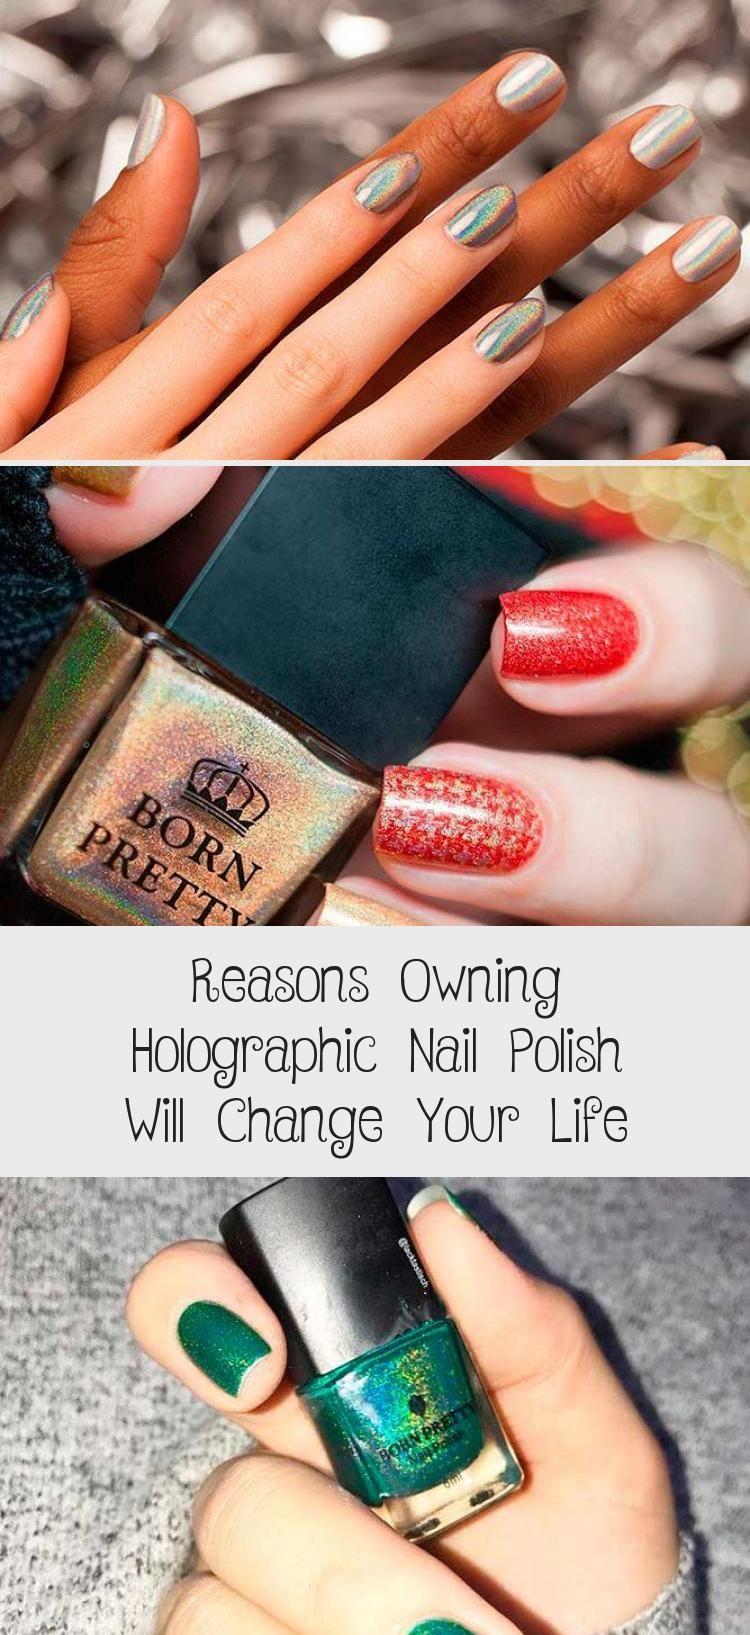 Photo of Reasons Owning Holographic Nail Polish Will Change Your Life – Nail Art